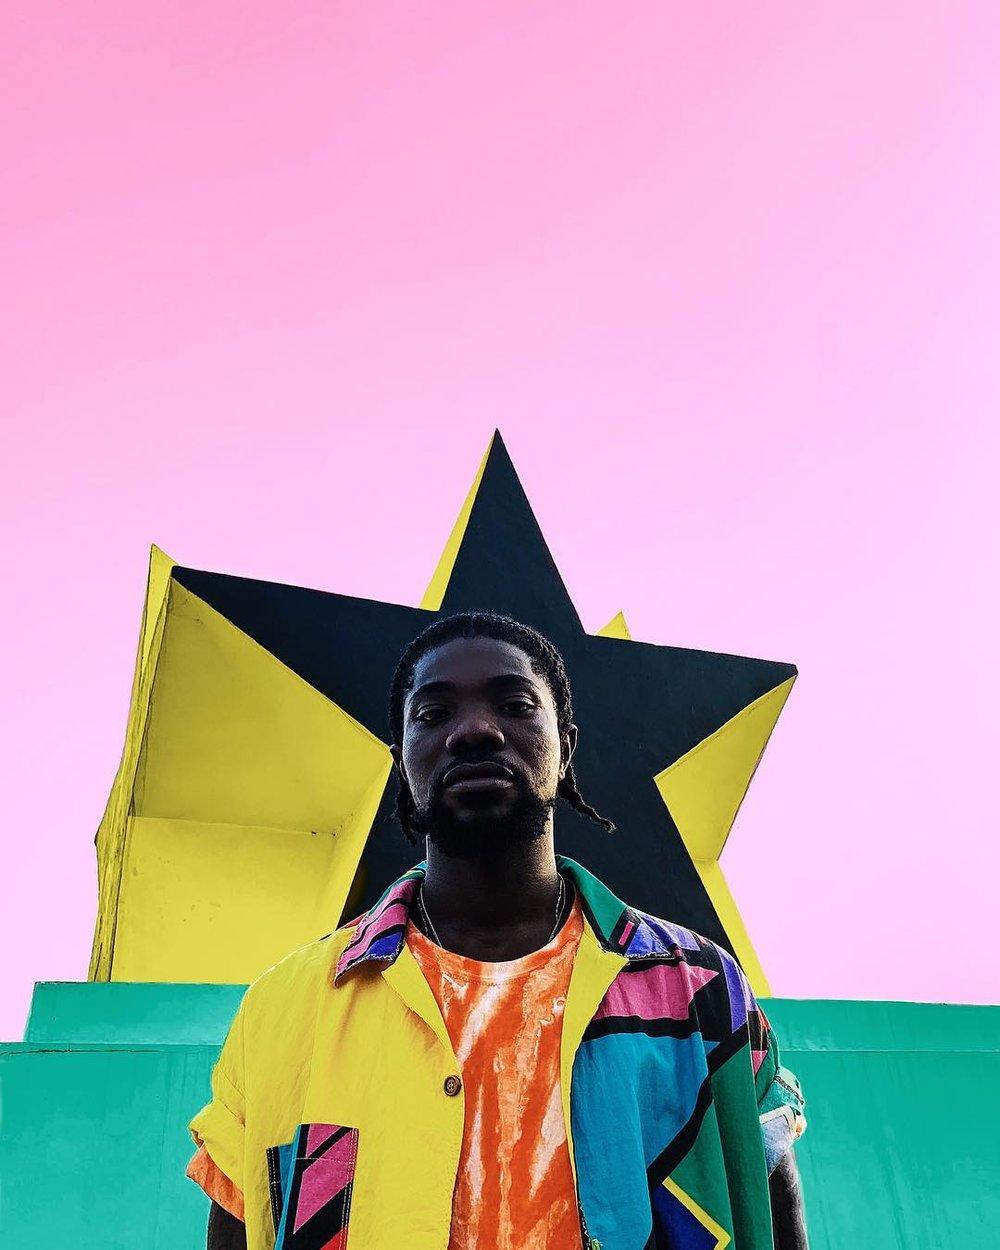 ghanaian photographer prince gyasi captures hiplife artists in a vibrant  series — Globetrotter Magazine